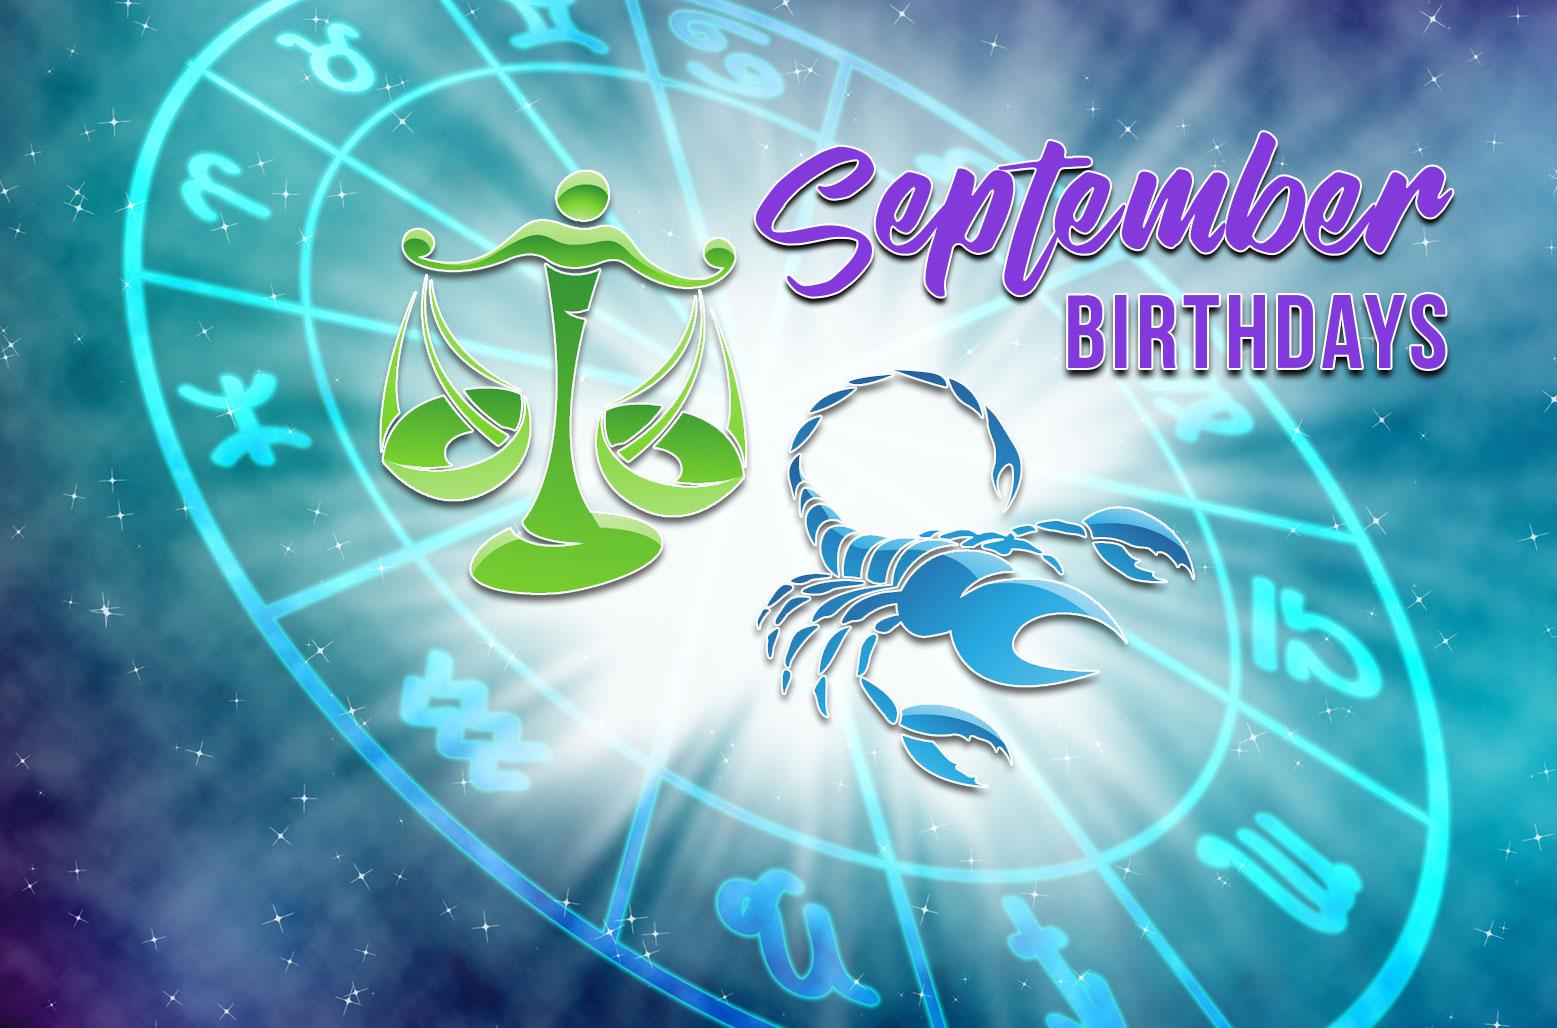 September Birthday Party Cruise